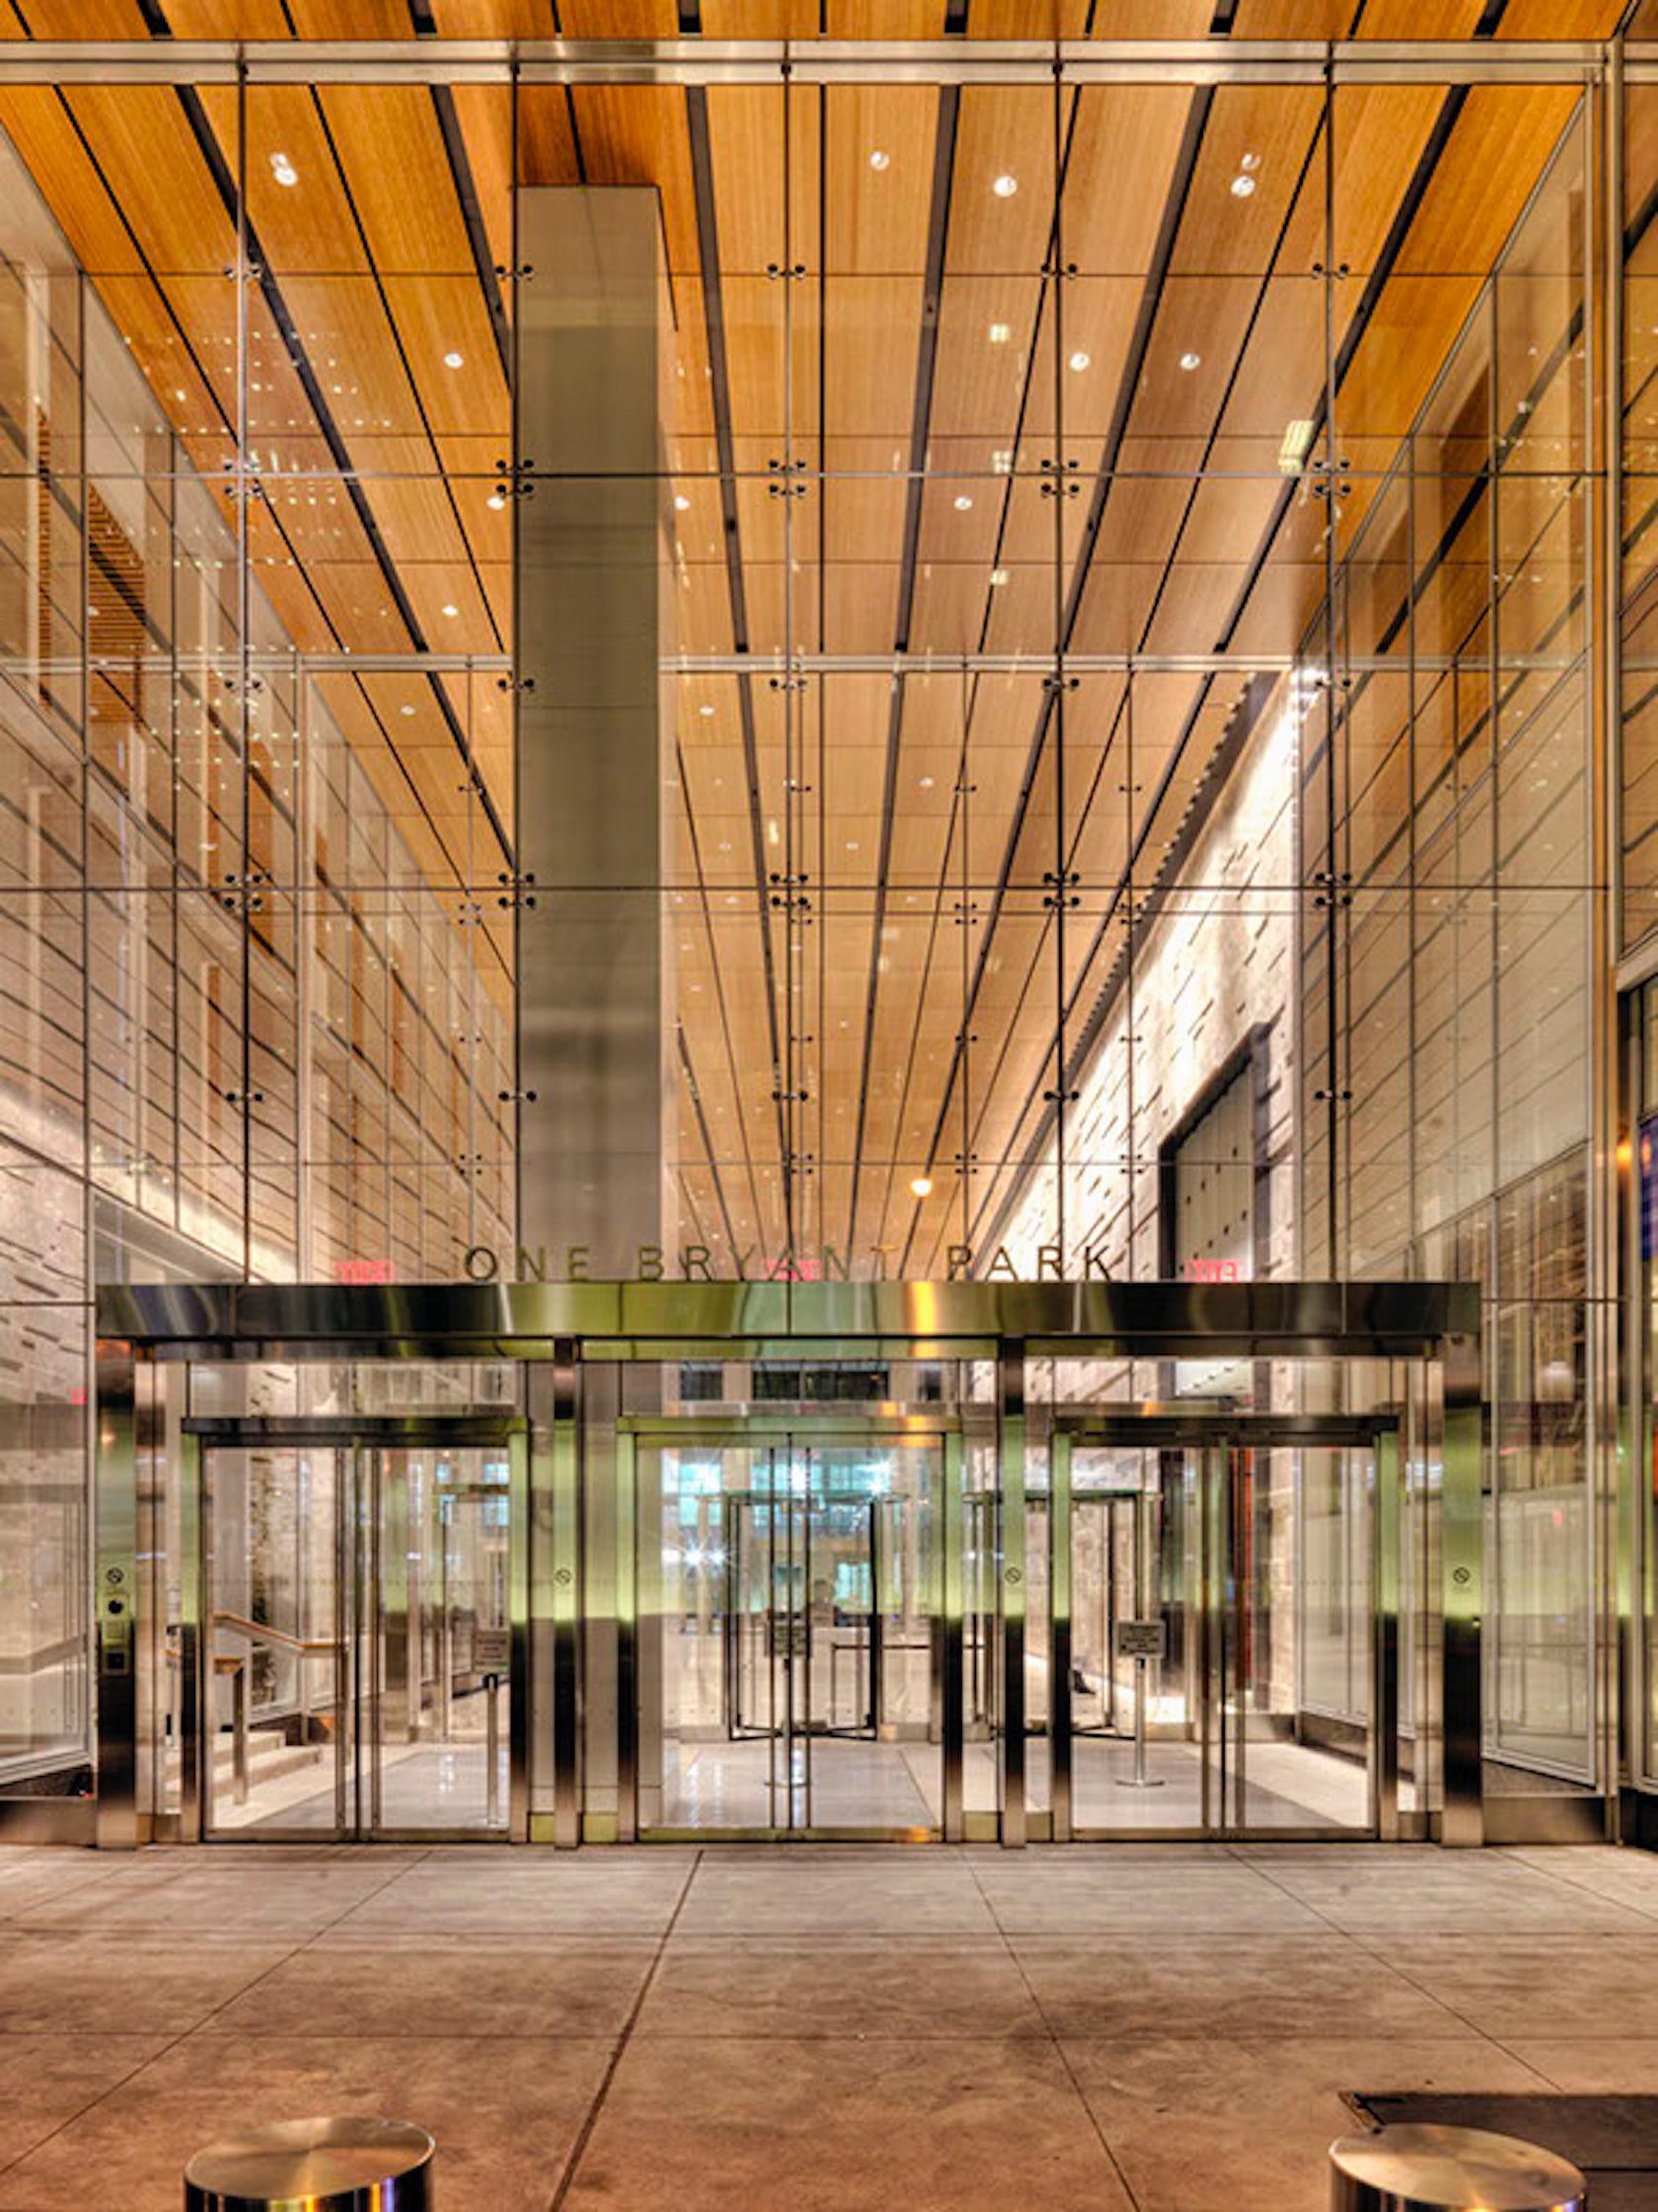 Bridge Street Auto >> Bank of America Tower at One Bryant Park (Lighting Design) - Architizer